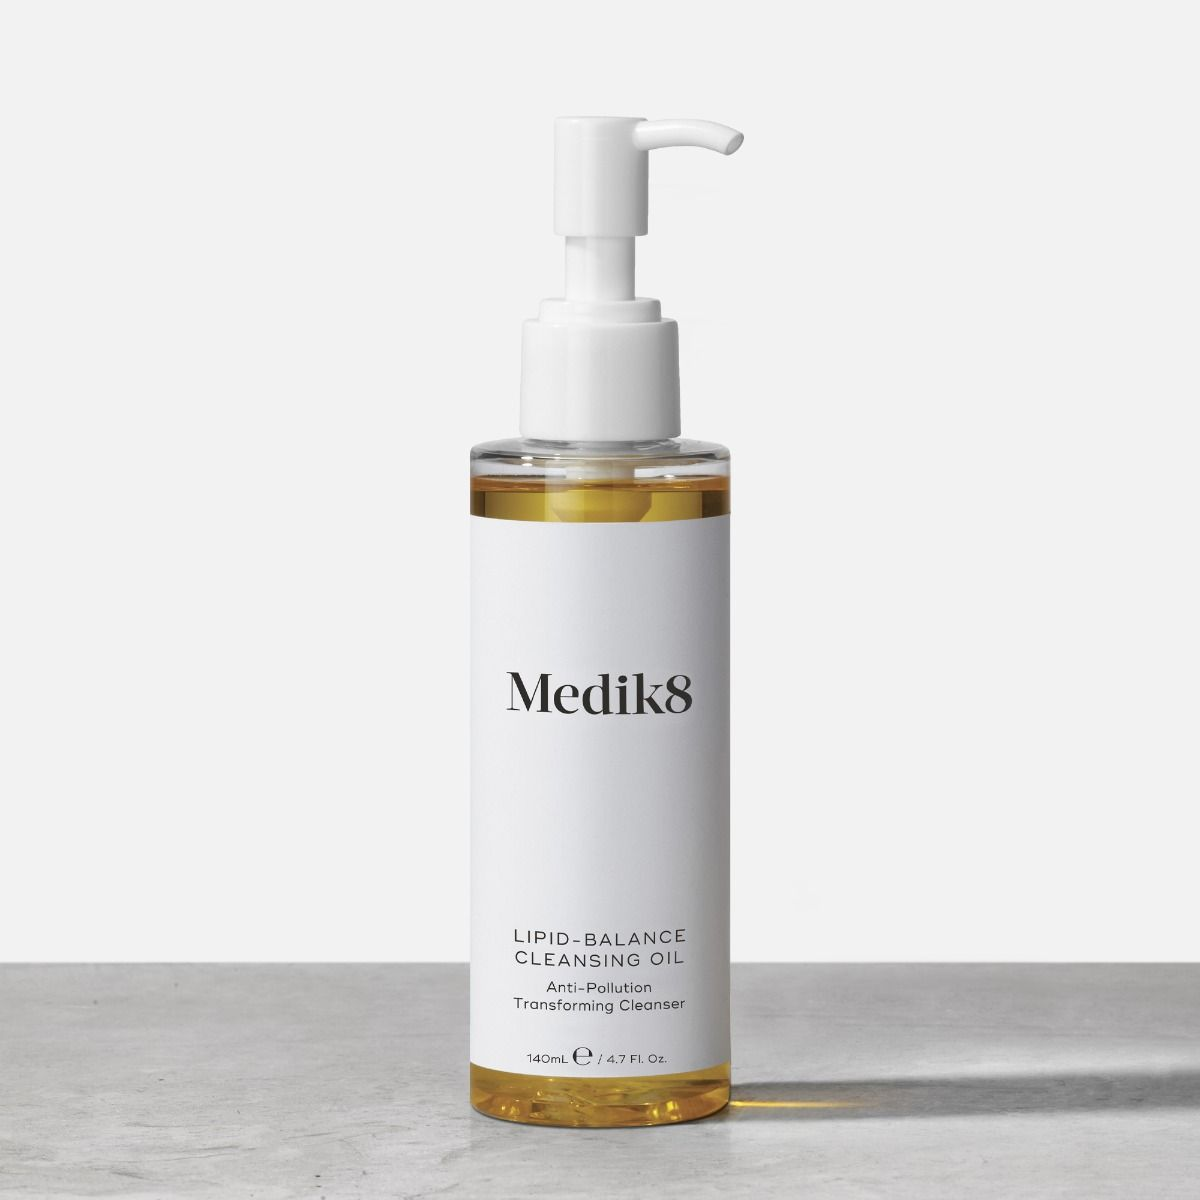 Medik8-Lipid-Balance-Cleansing-Oil